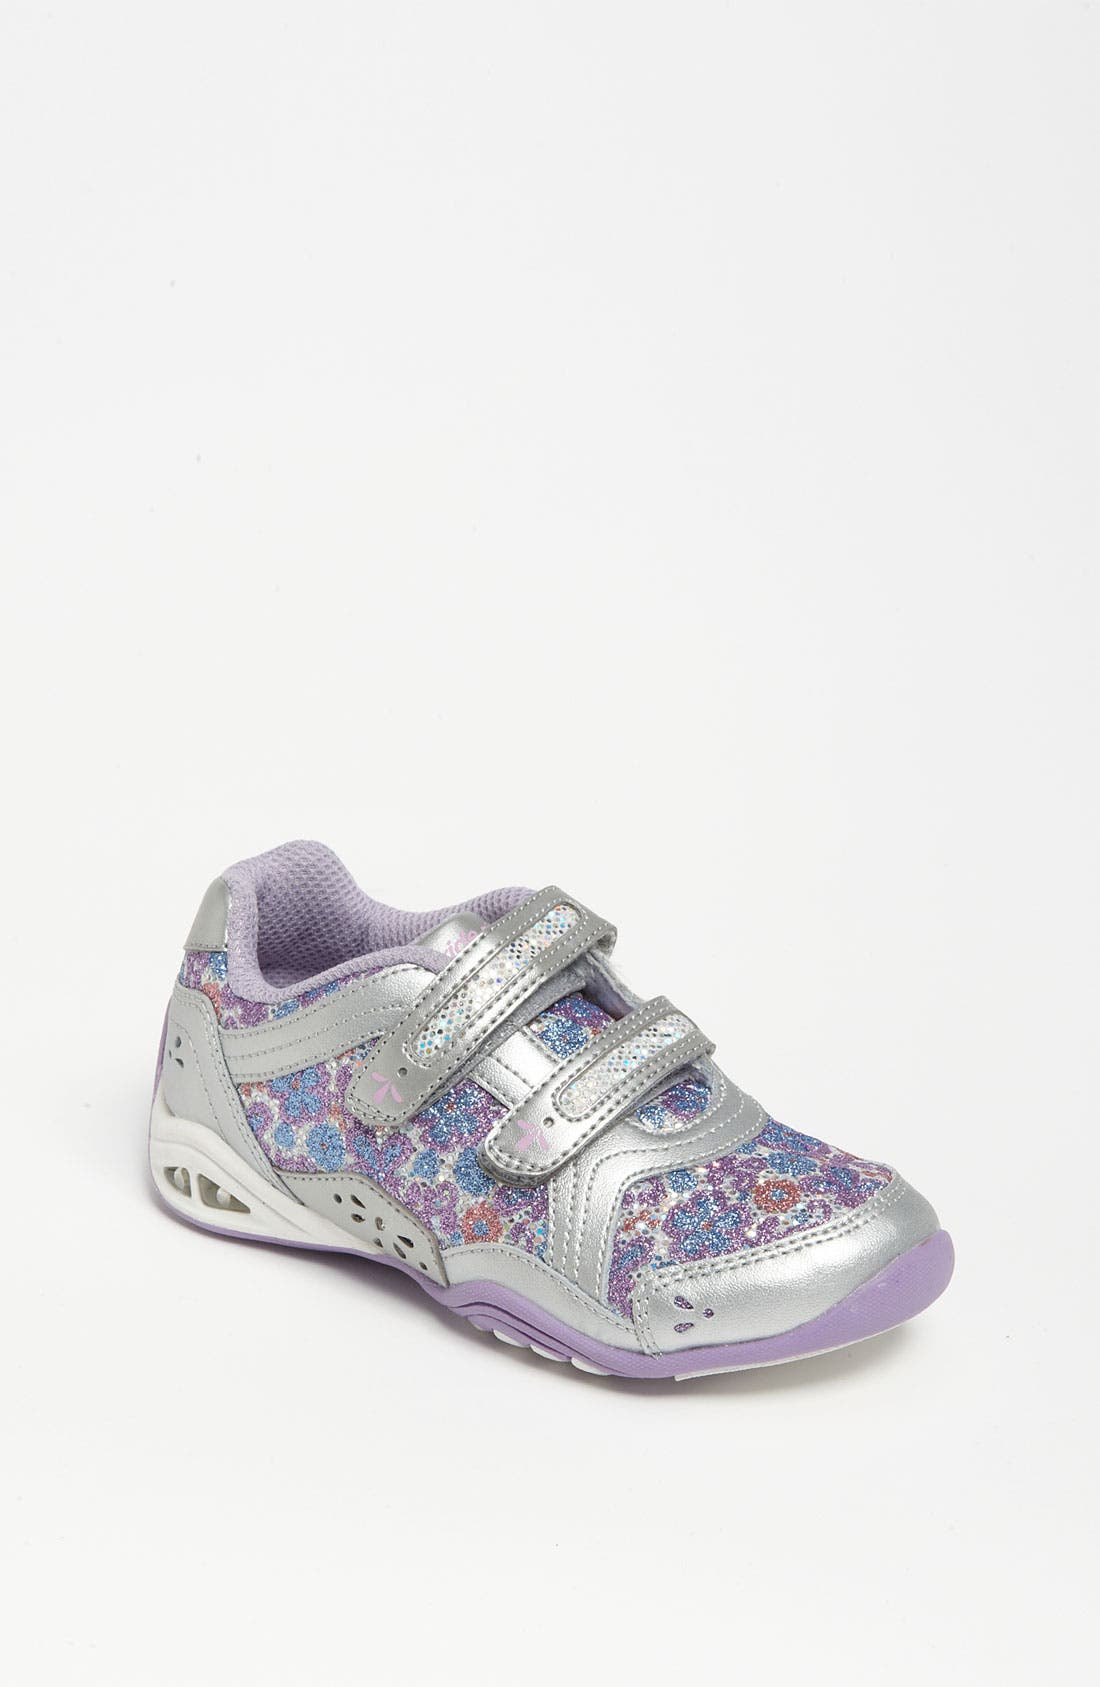 Alternate Image 1 Selected - Stride Rite 'Jade' Sneaker (Walker, Toddler & Little Kid)